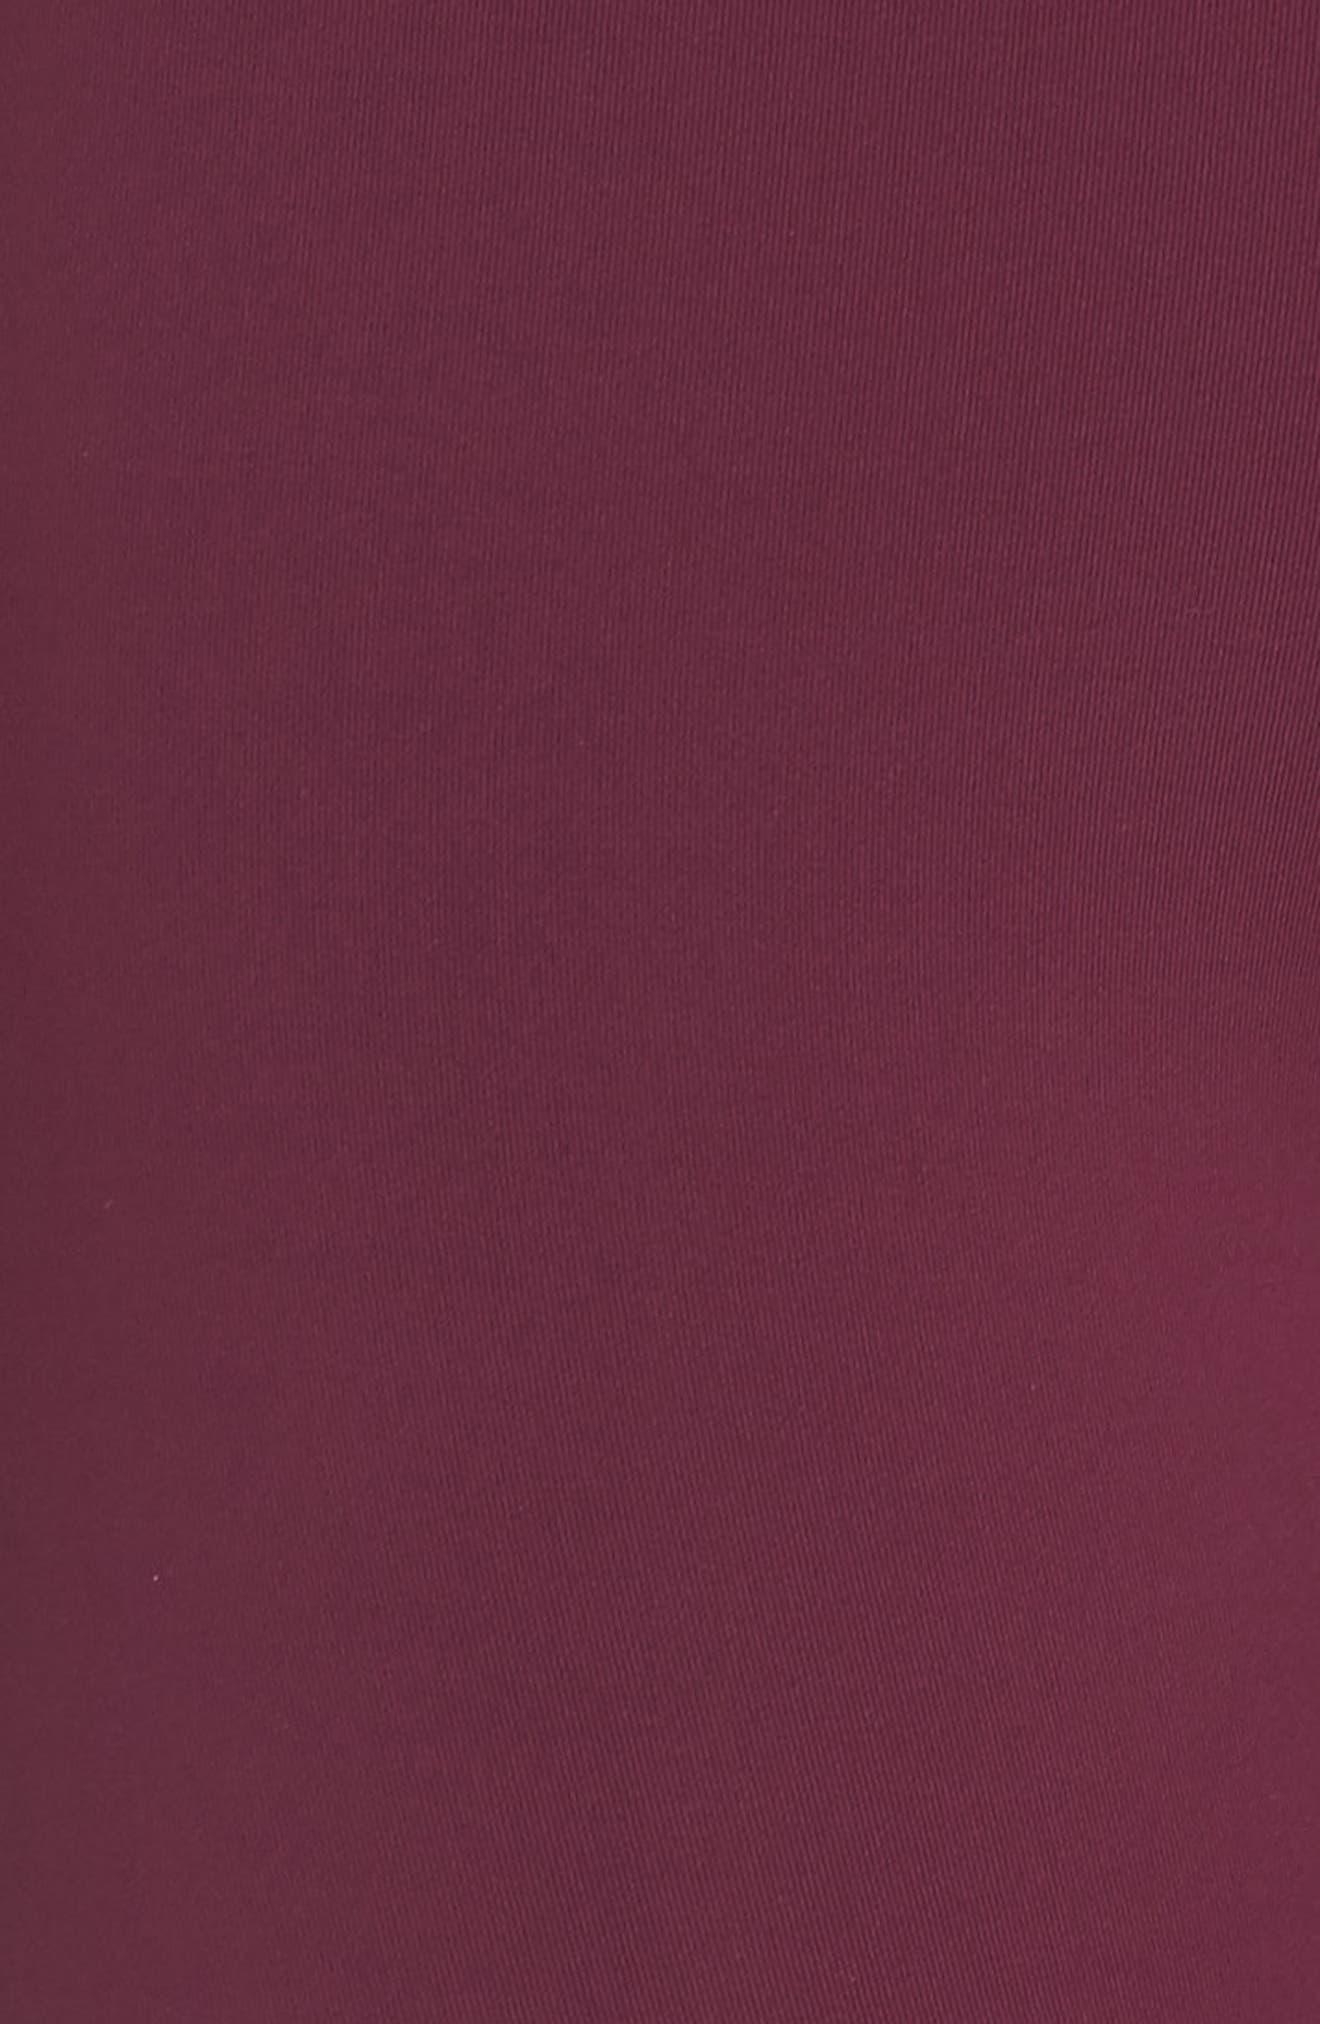 NikeLab Collection Dri-FIT Women's Tights,                             Alternate thumbnail 6, color,                             BORDEAUX